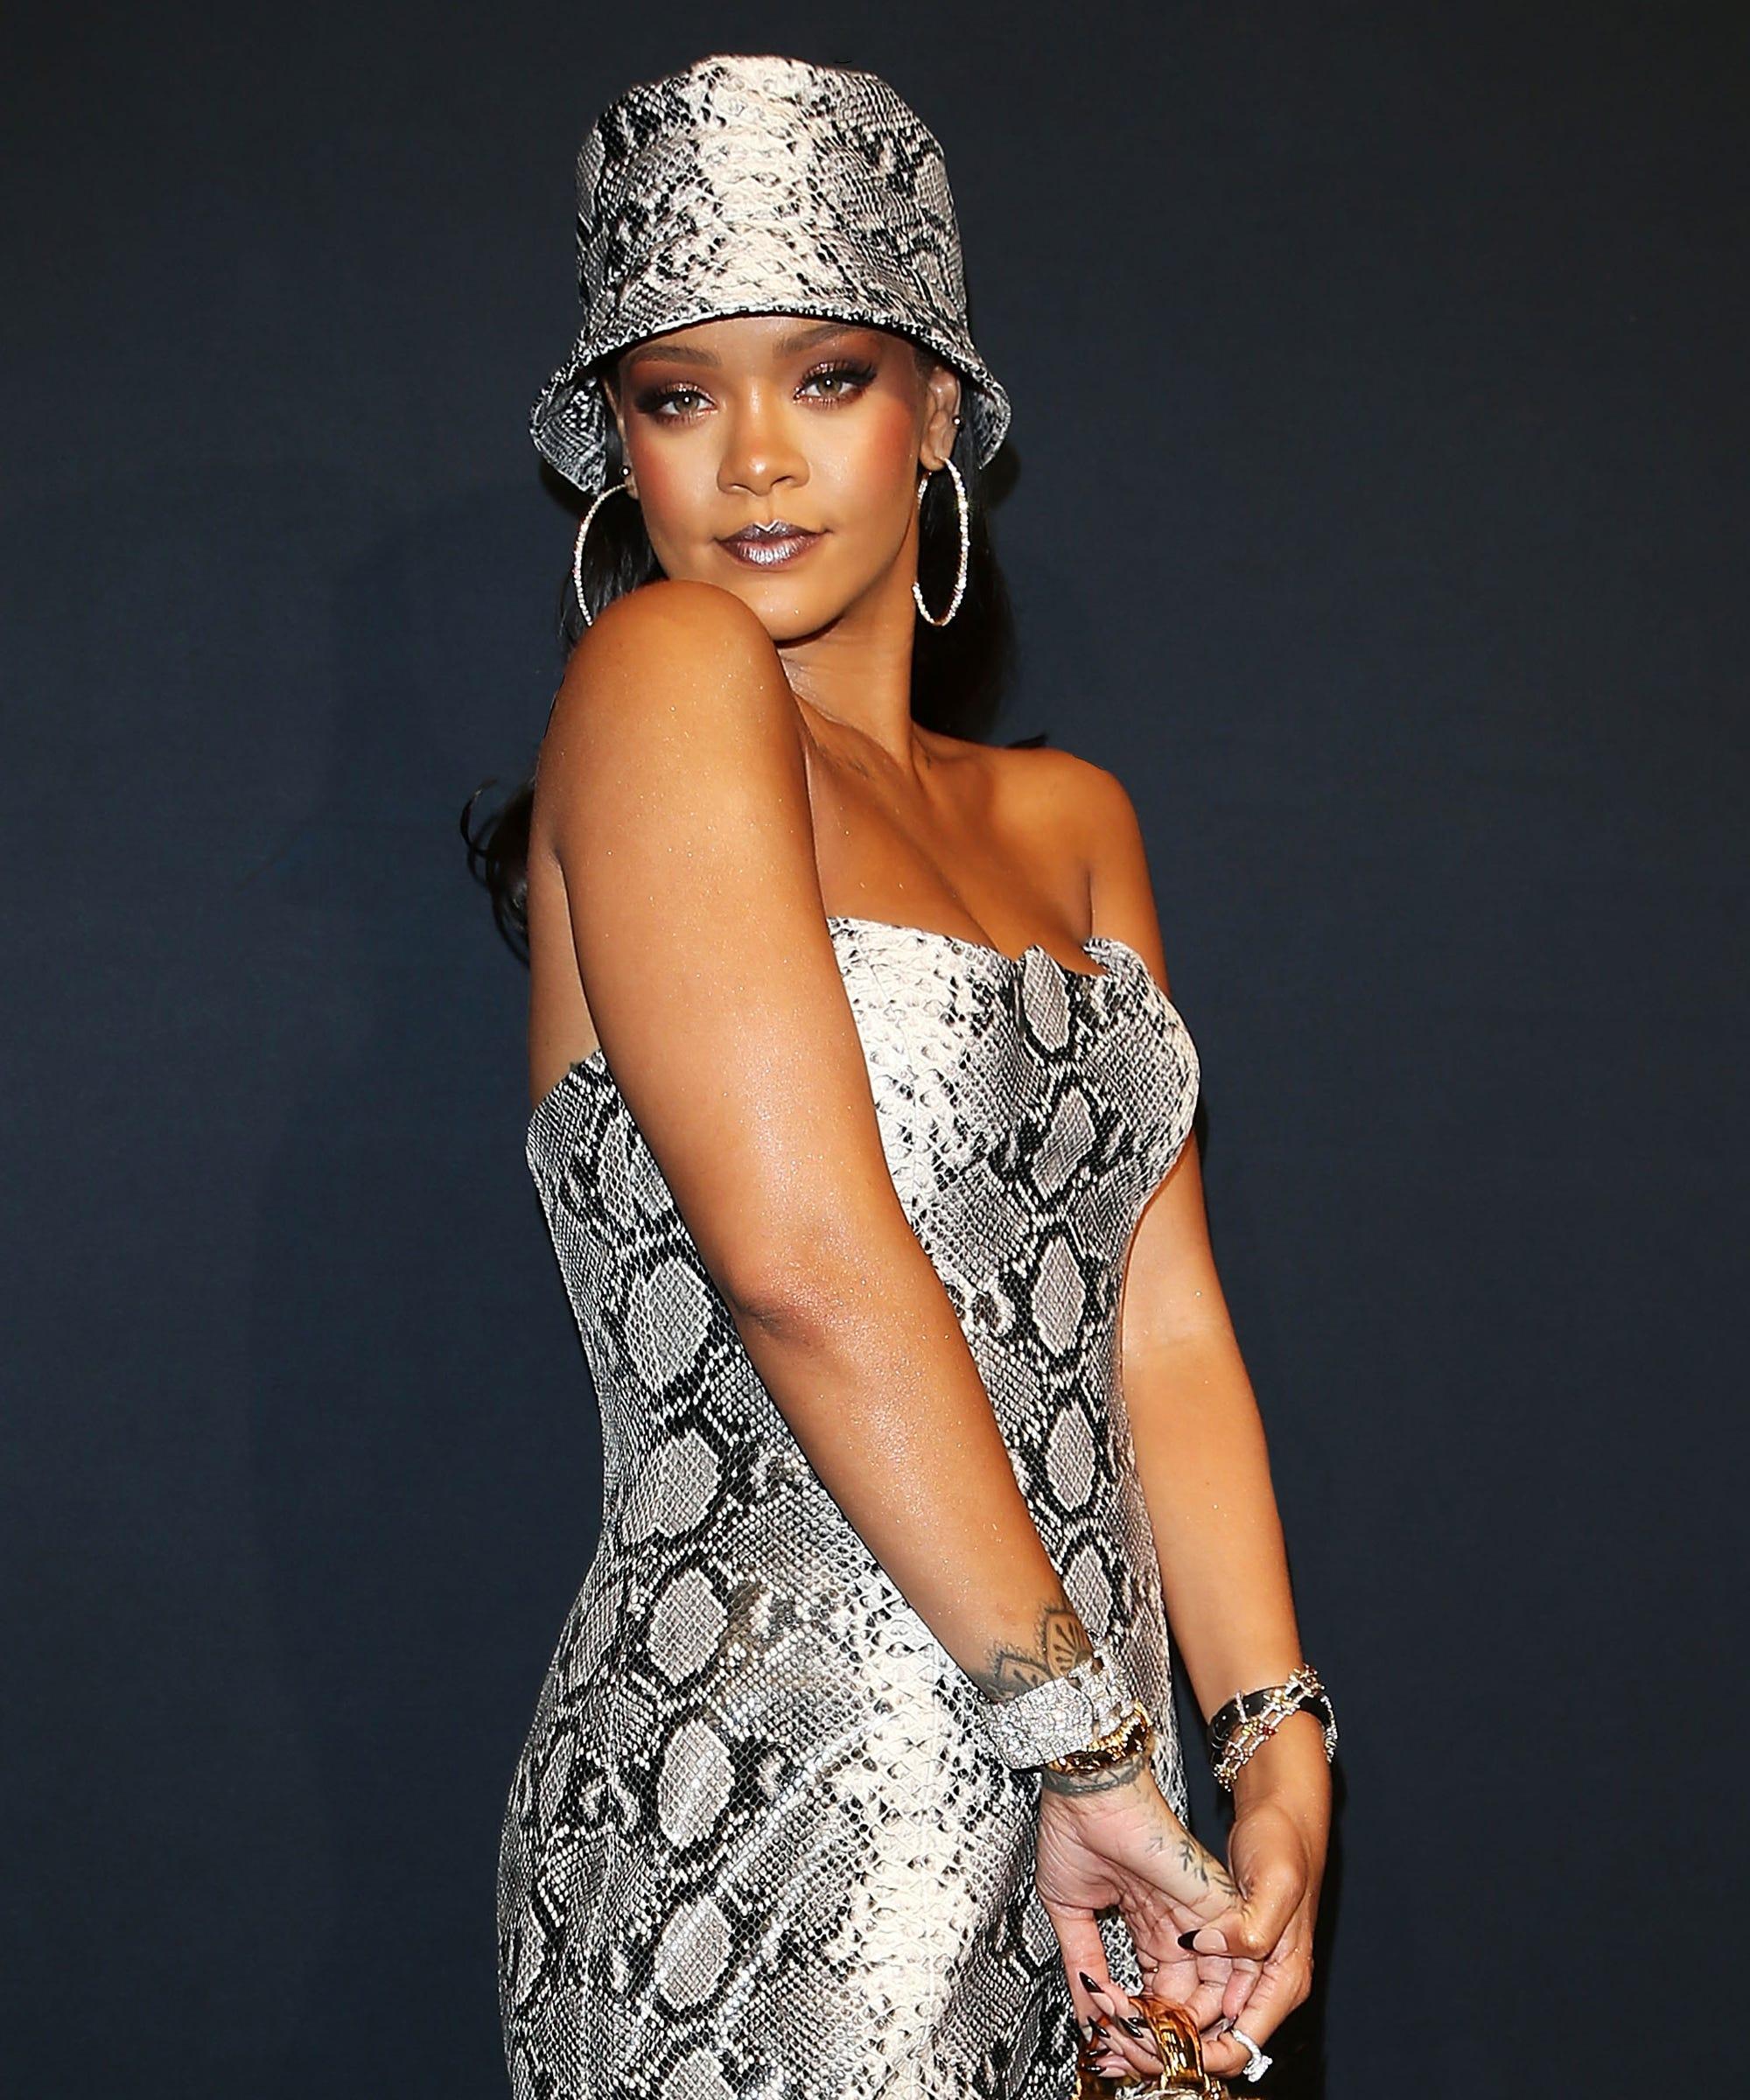 How To Shop Rihanna's New Fenty Clothing Line